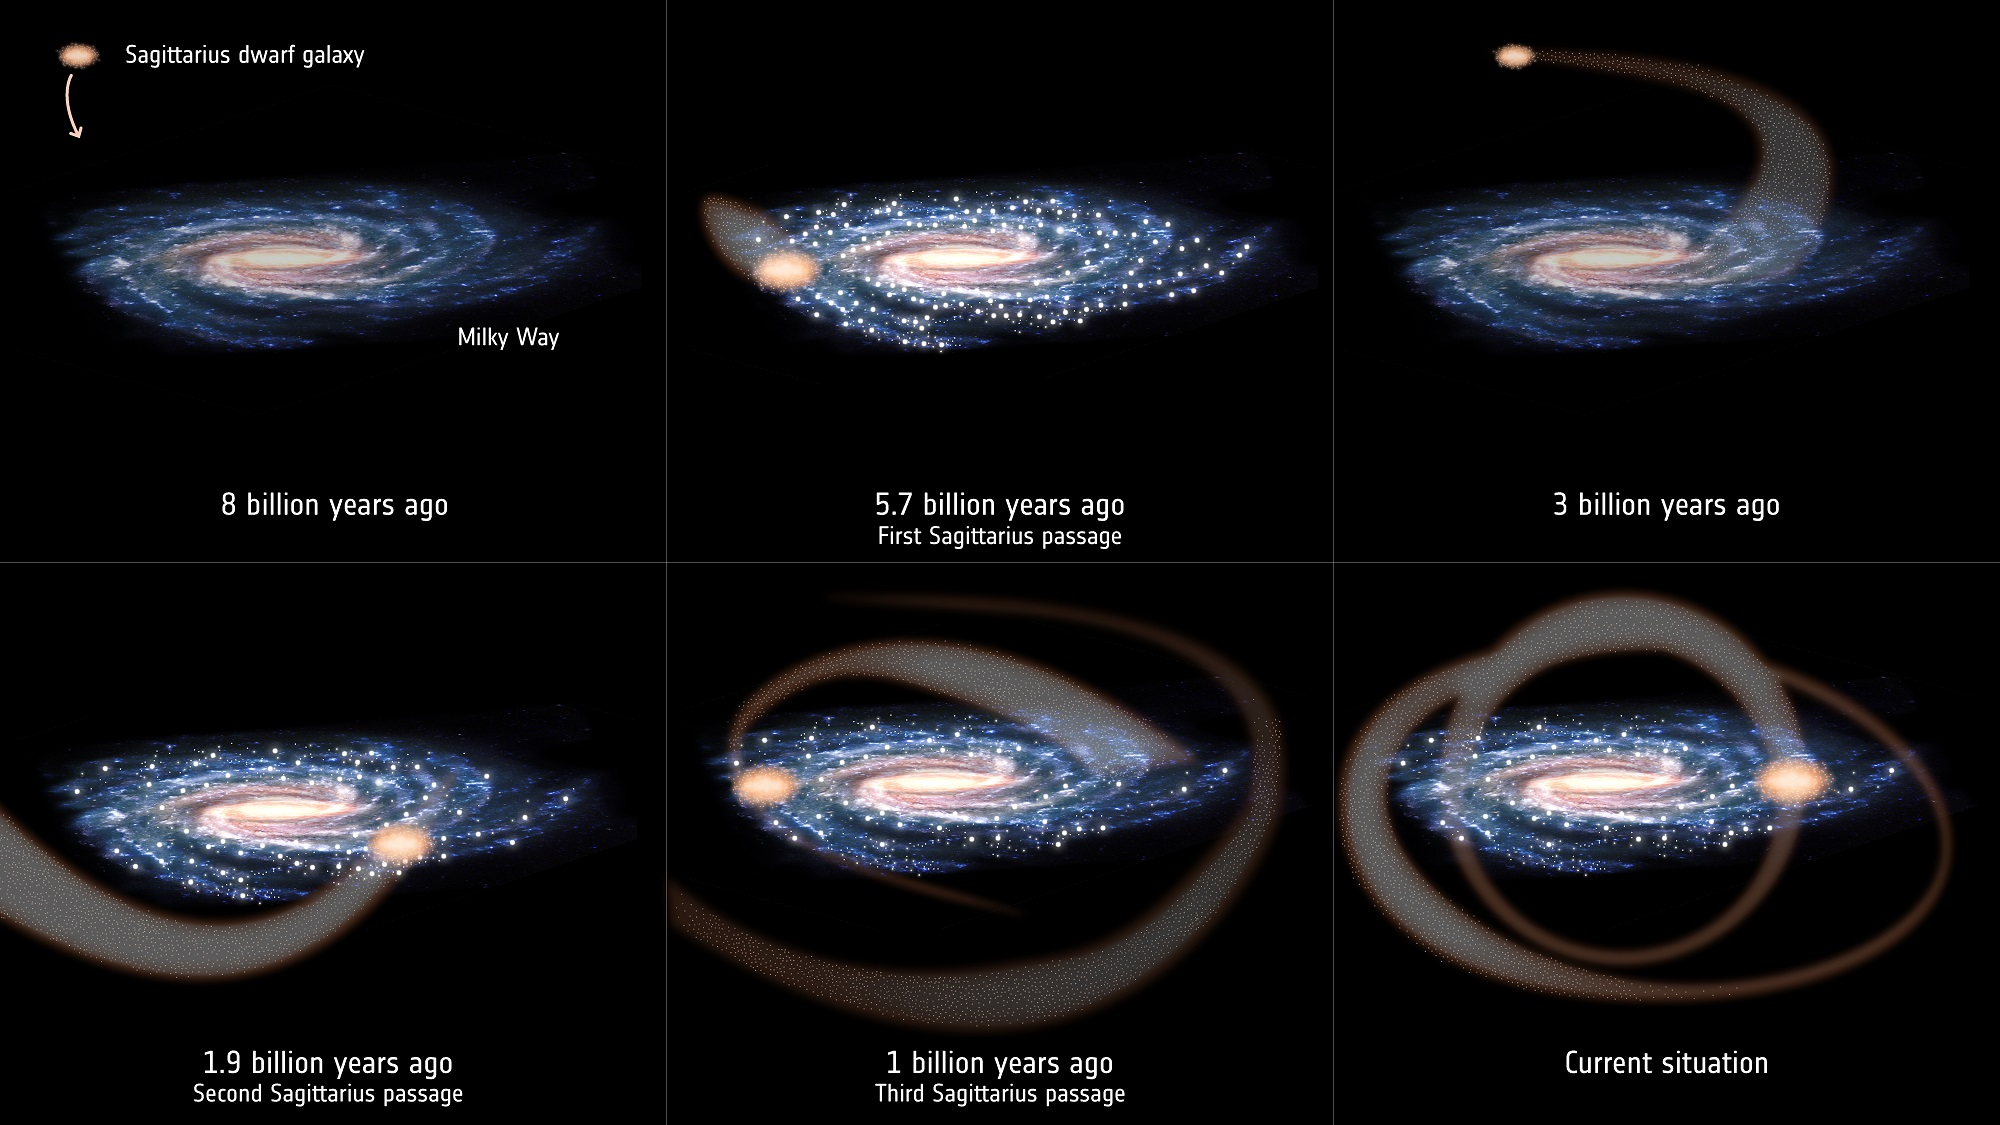 Gaia_Sagittarius_Dwarf_infographic_2k.jpg